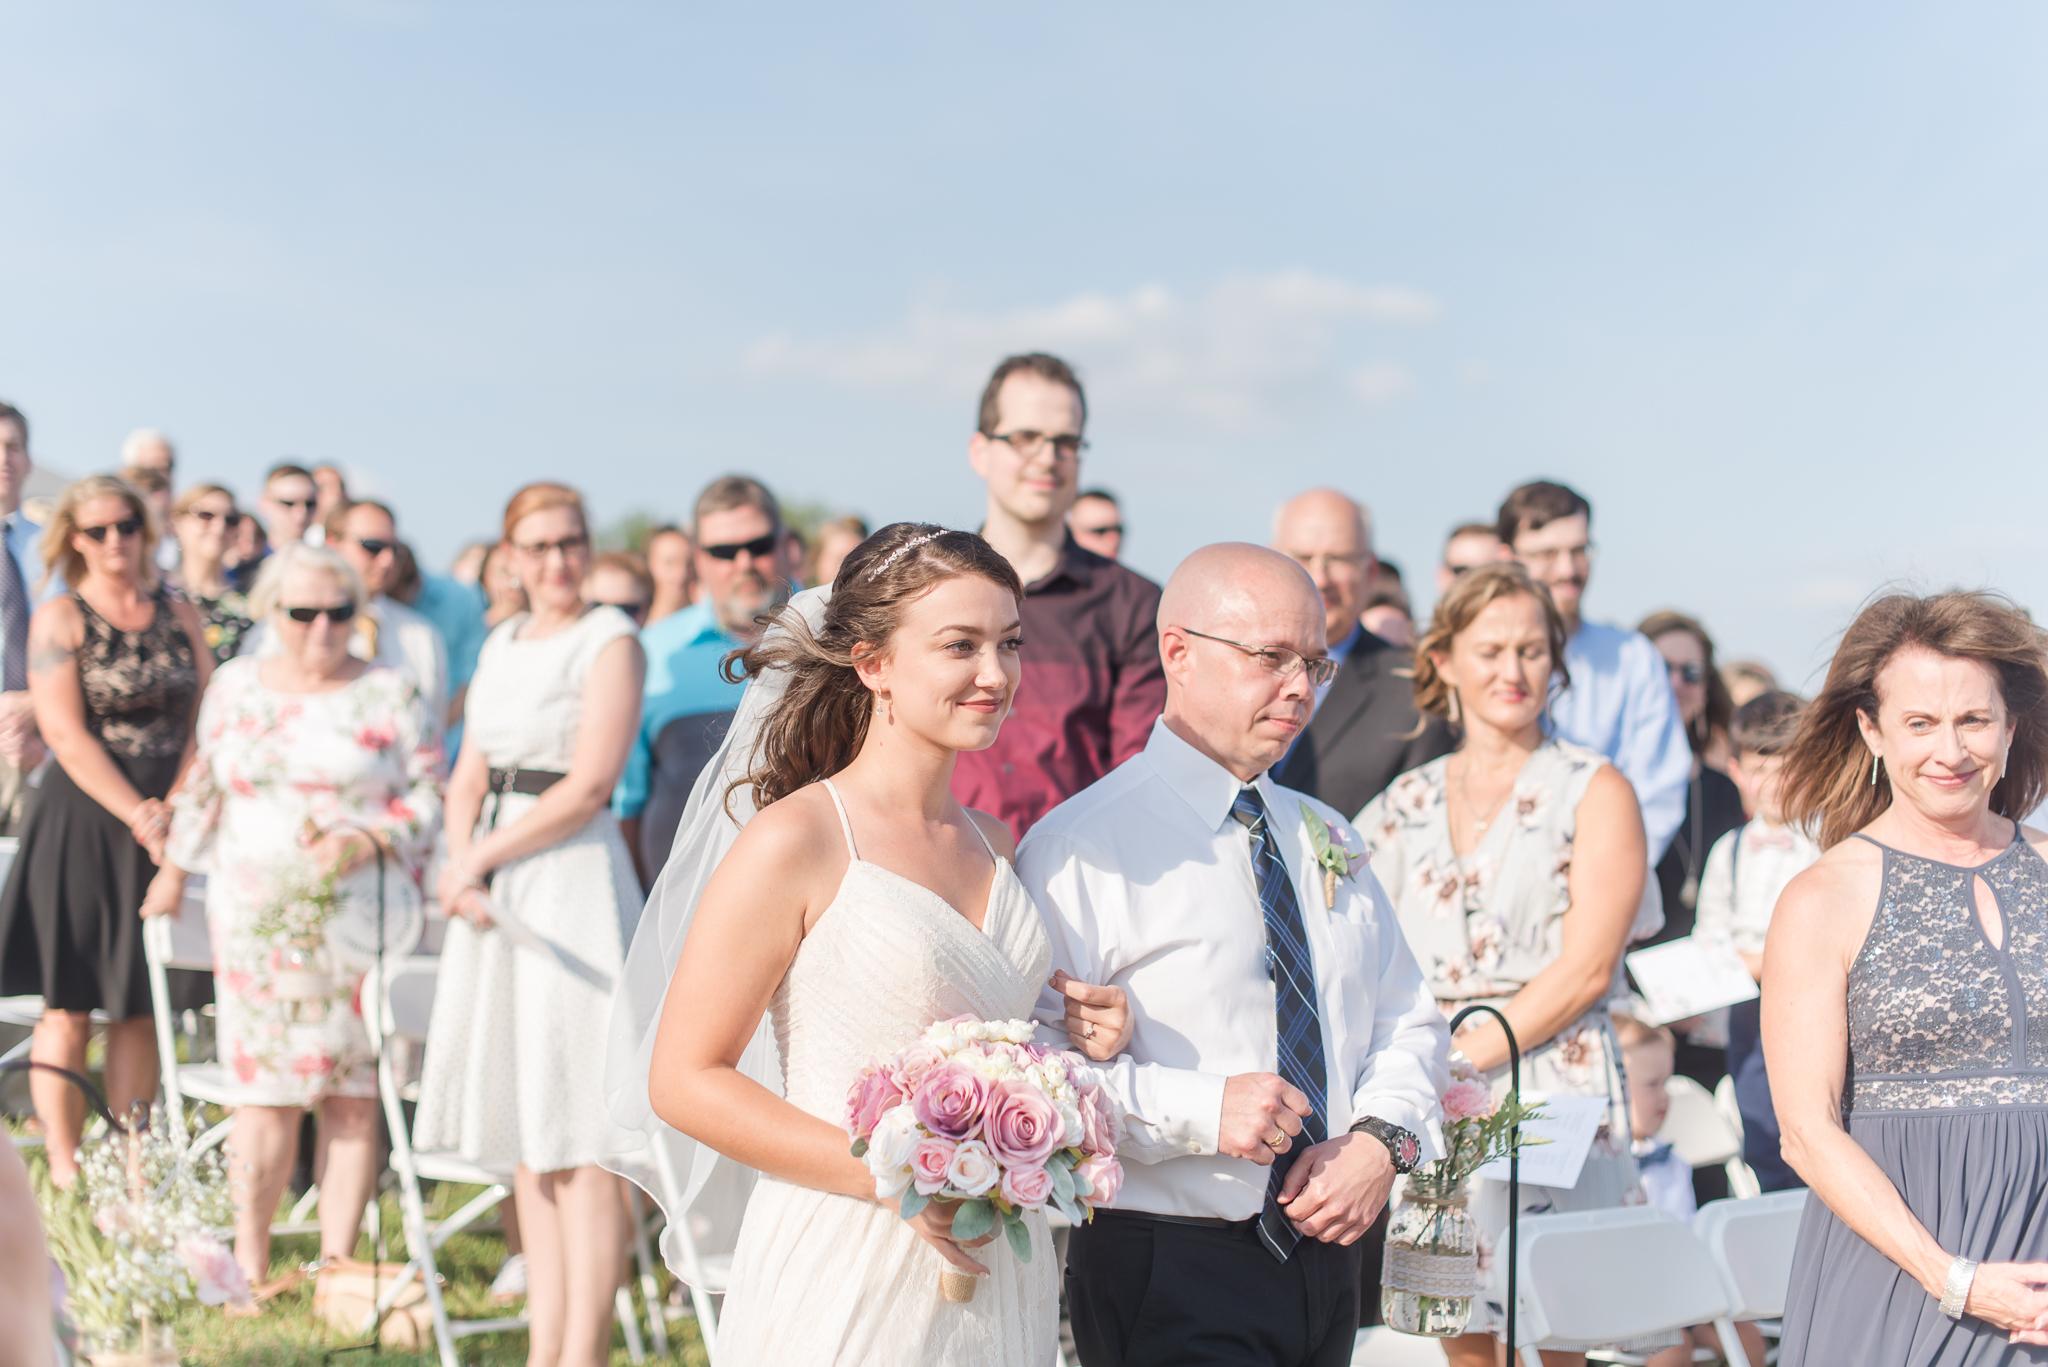 Anderson, Indiana Wedding Photographers4796.jpg